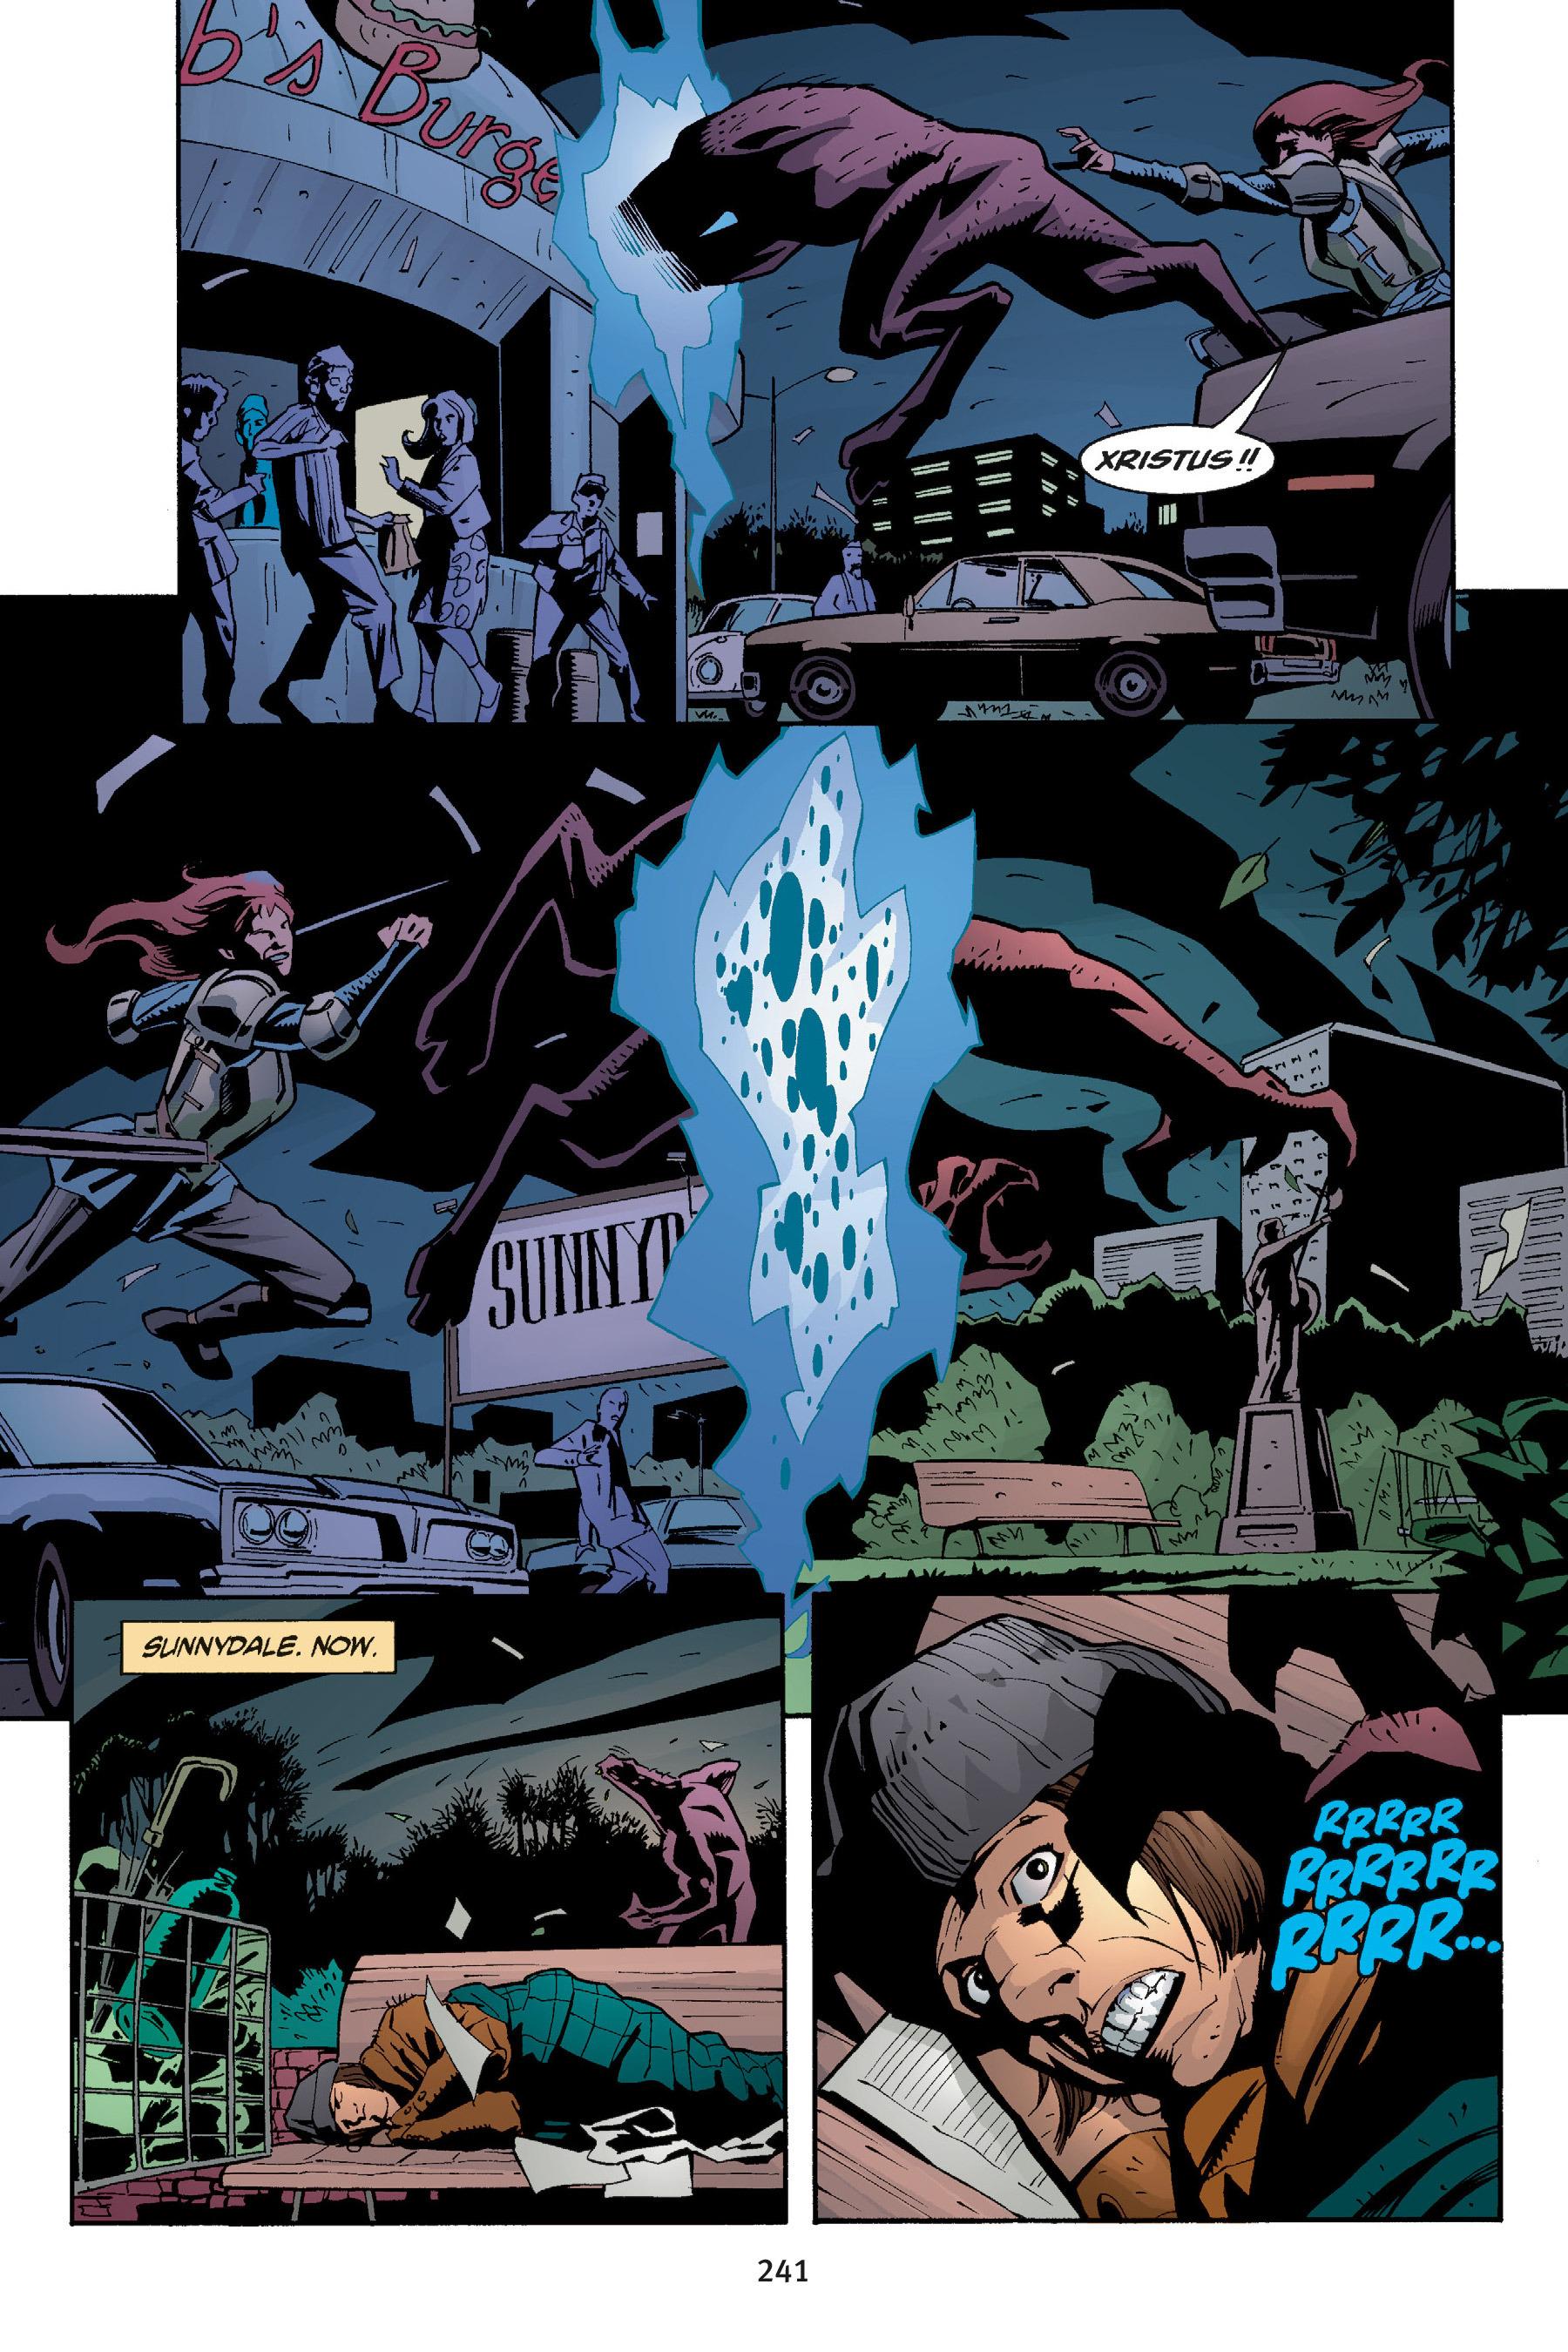 Read online Buffy the Vampire Slayer: Omnibus comic -  Issue # TPB 5 - 240